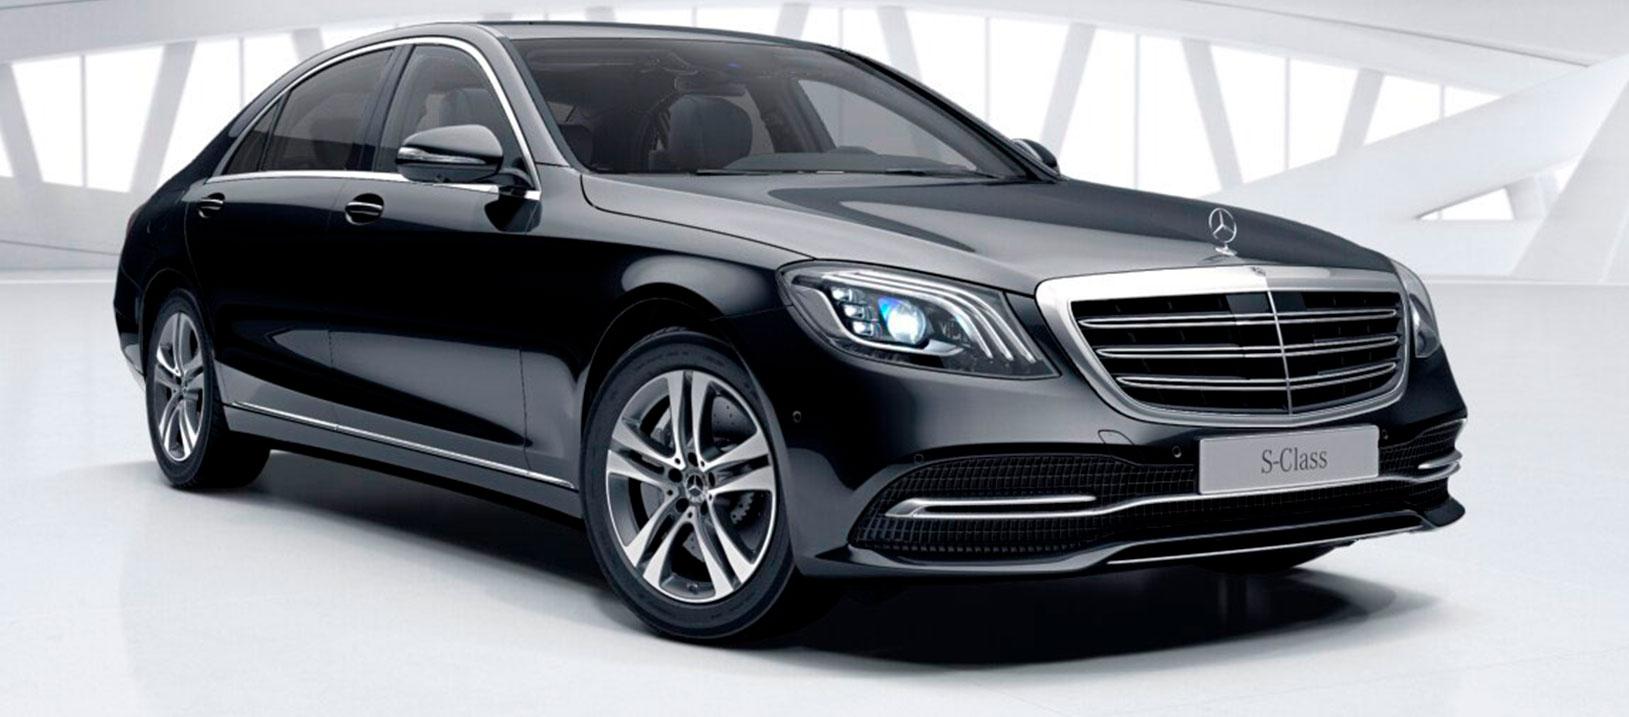 Mercedes-Benz S 350 d 4MATIC long 52600219